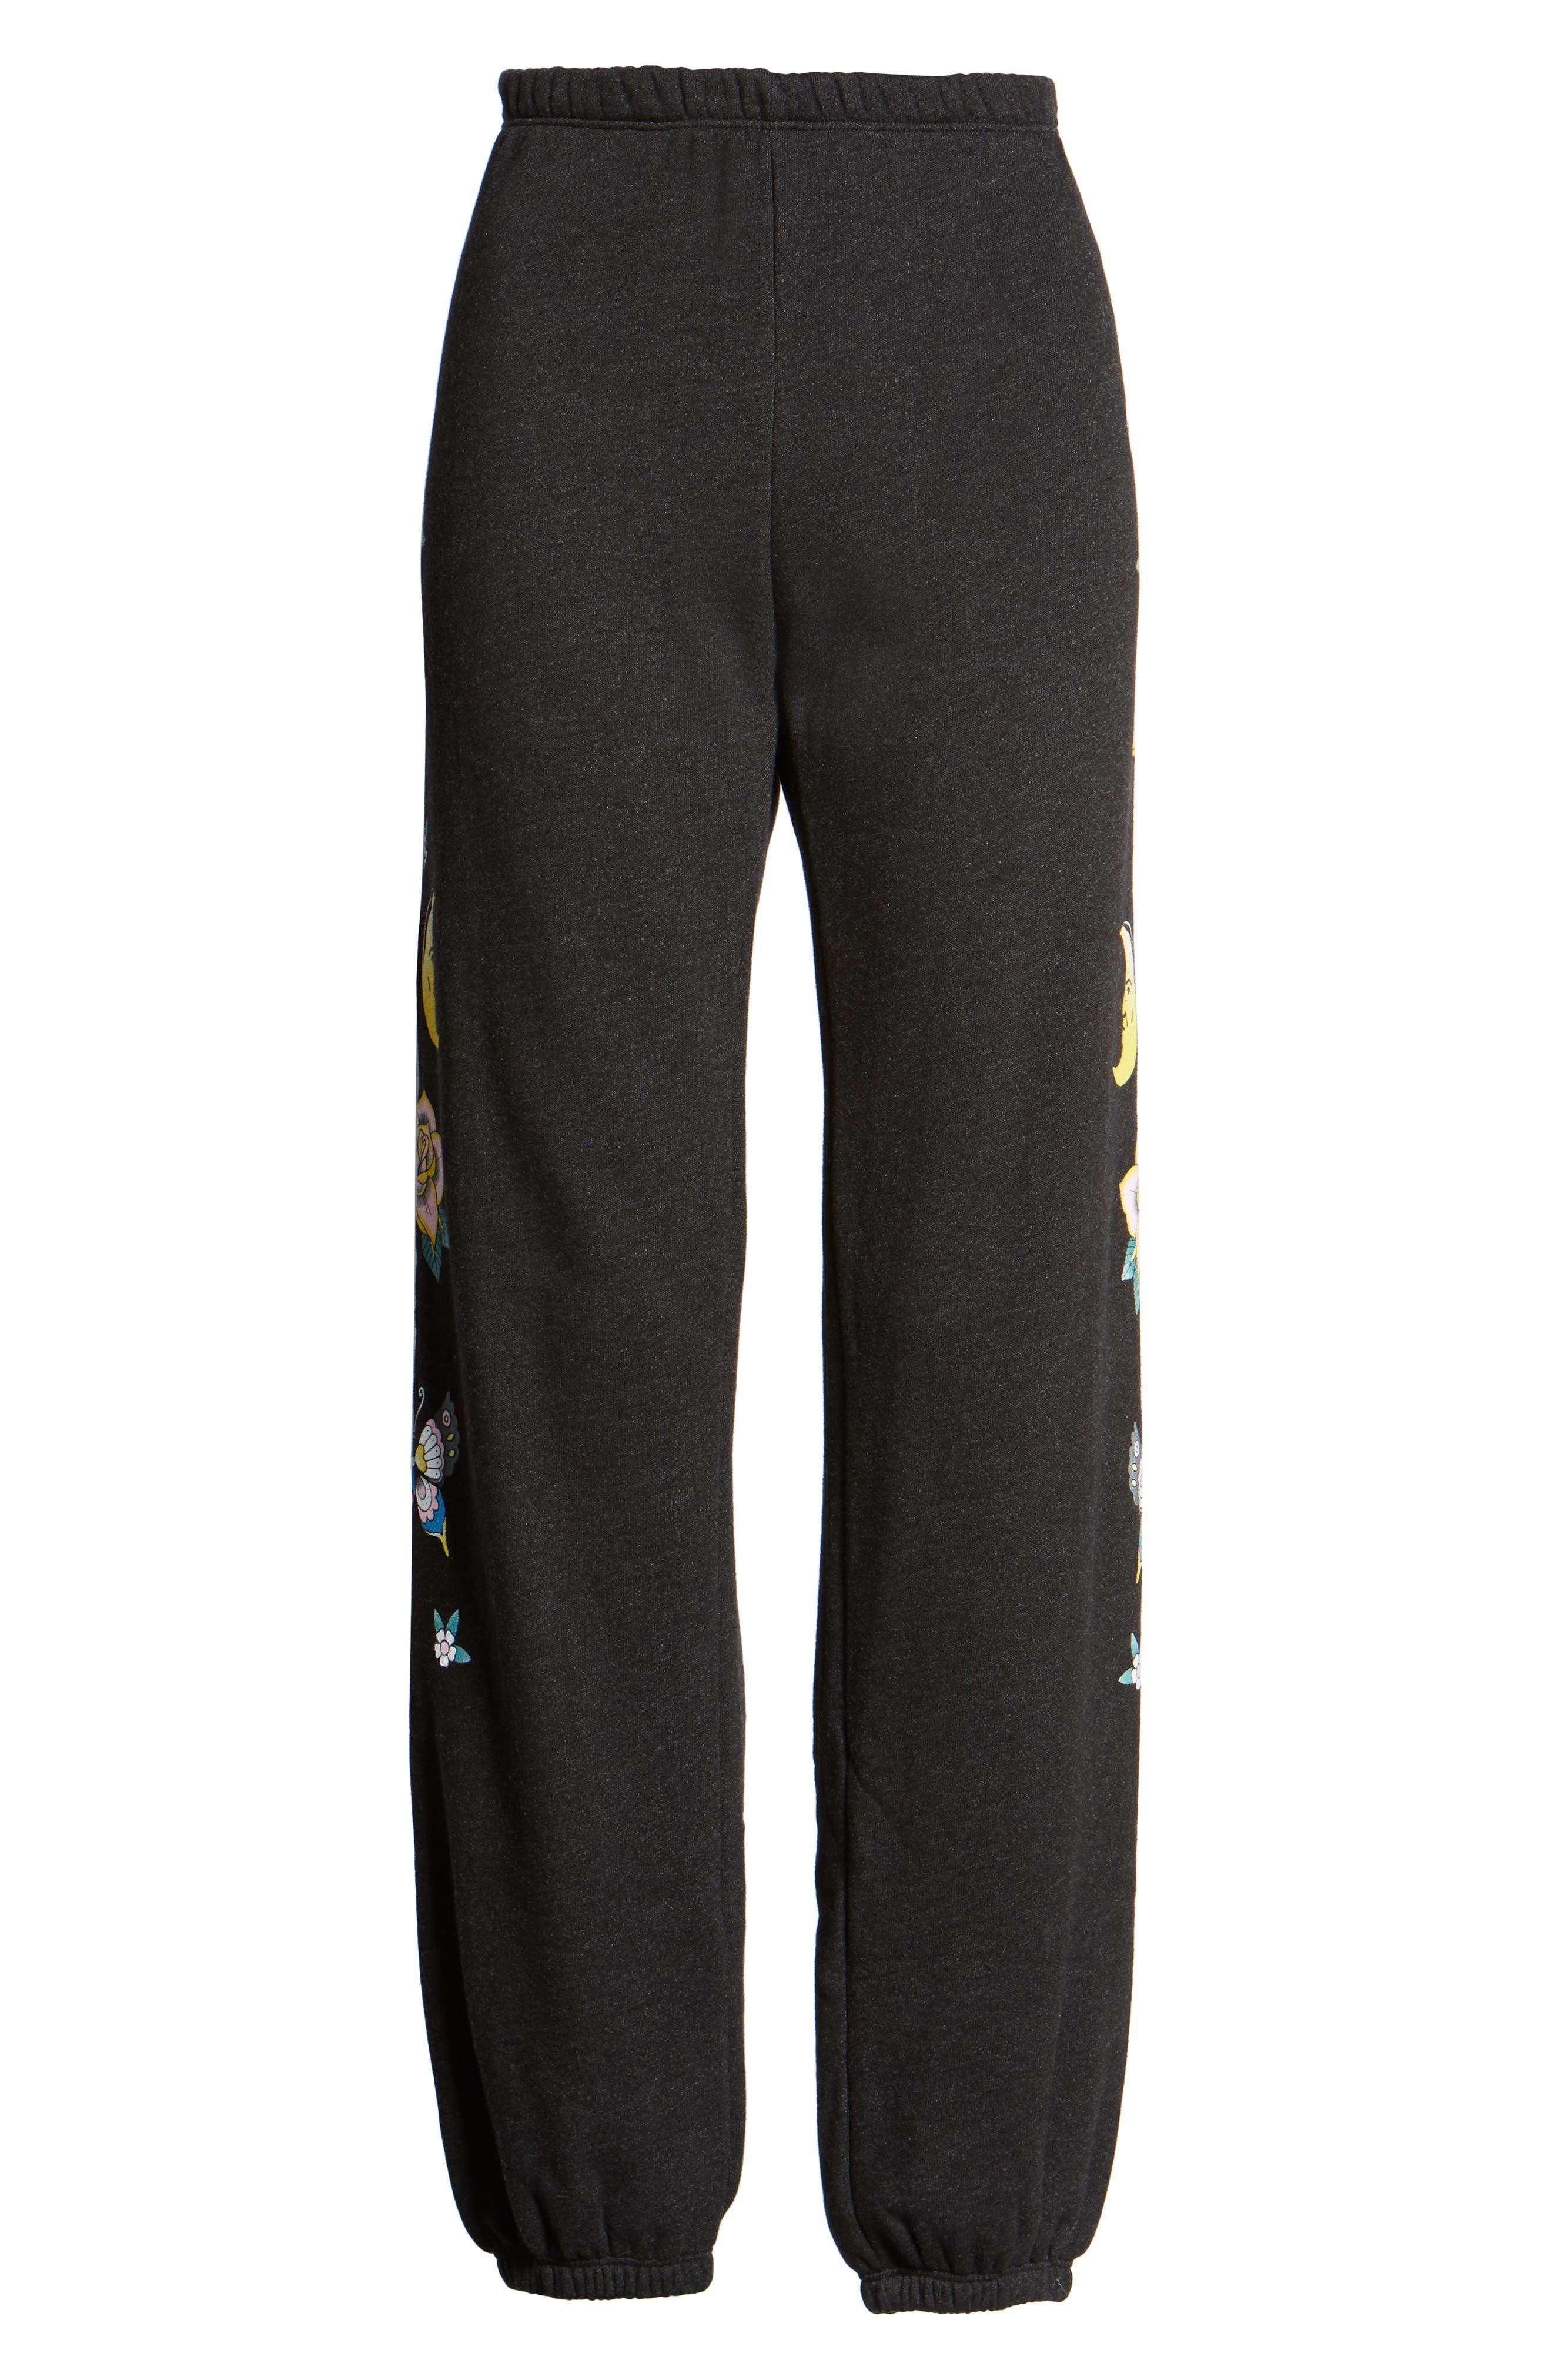 Flash Sweatpants,                             Alternate thumbnail 6, color,                             Black